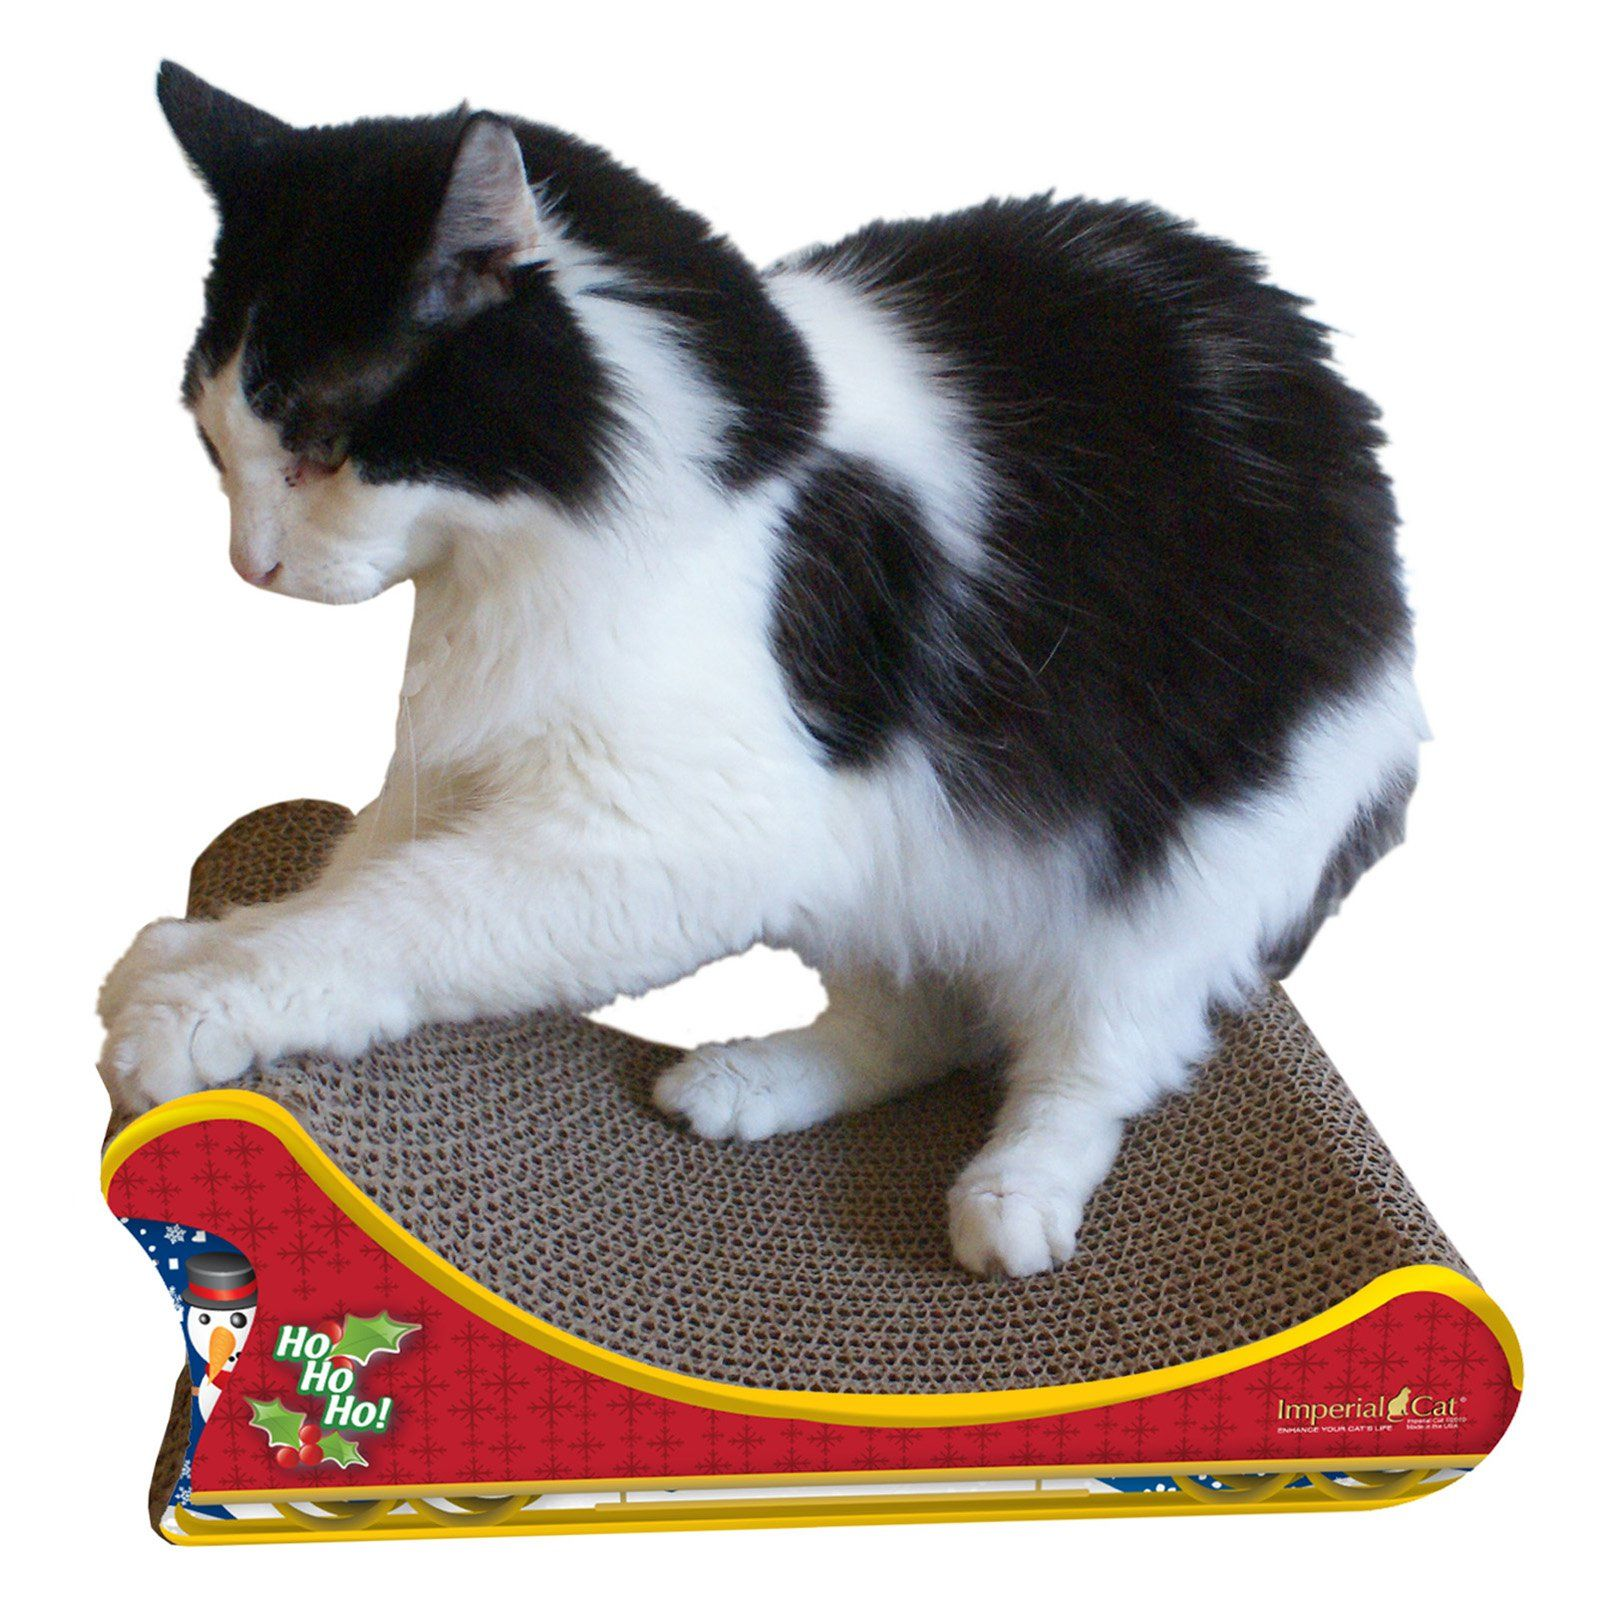 imperial cat sleigh scratch n shape in 2019 products cat rh pinterest com